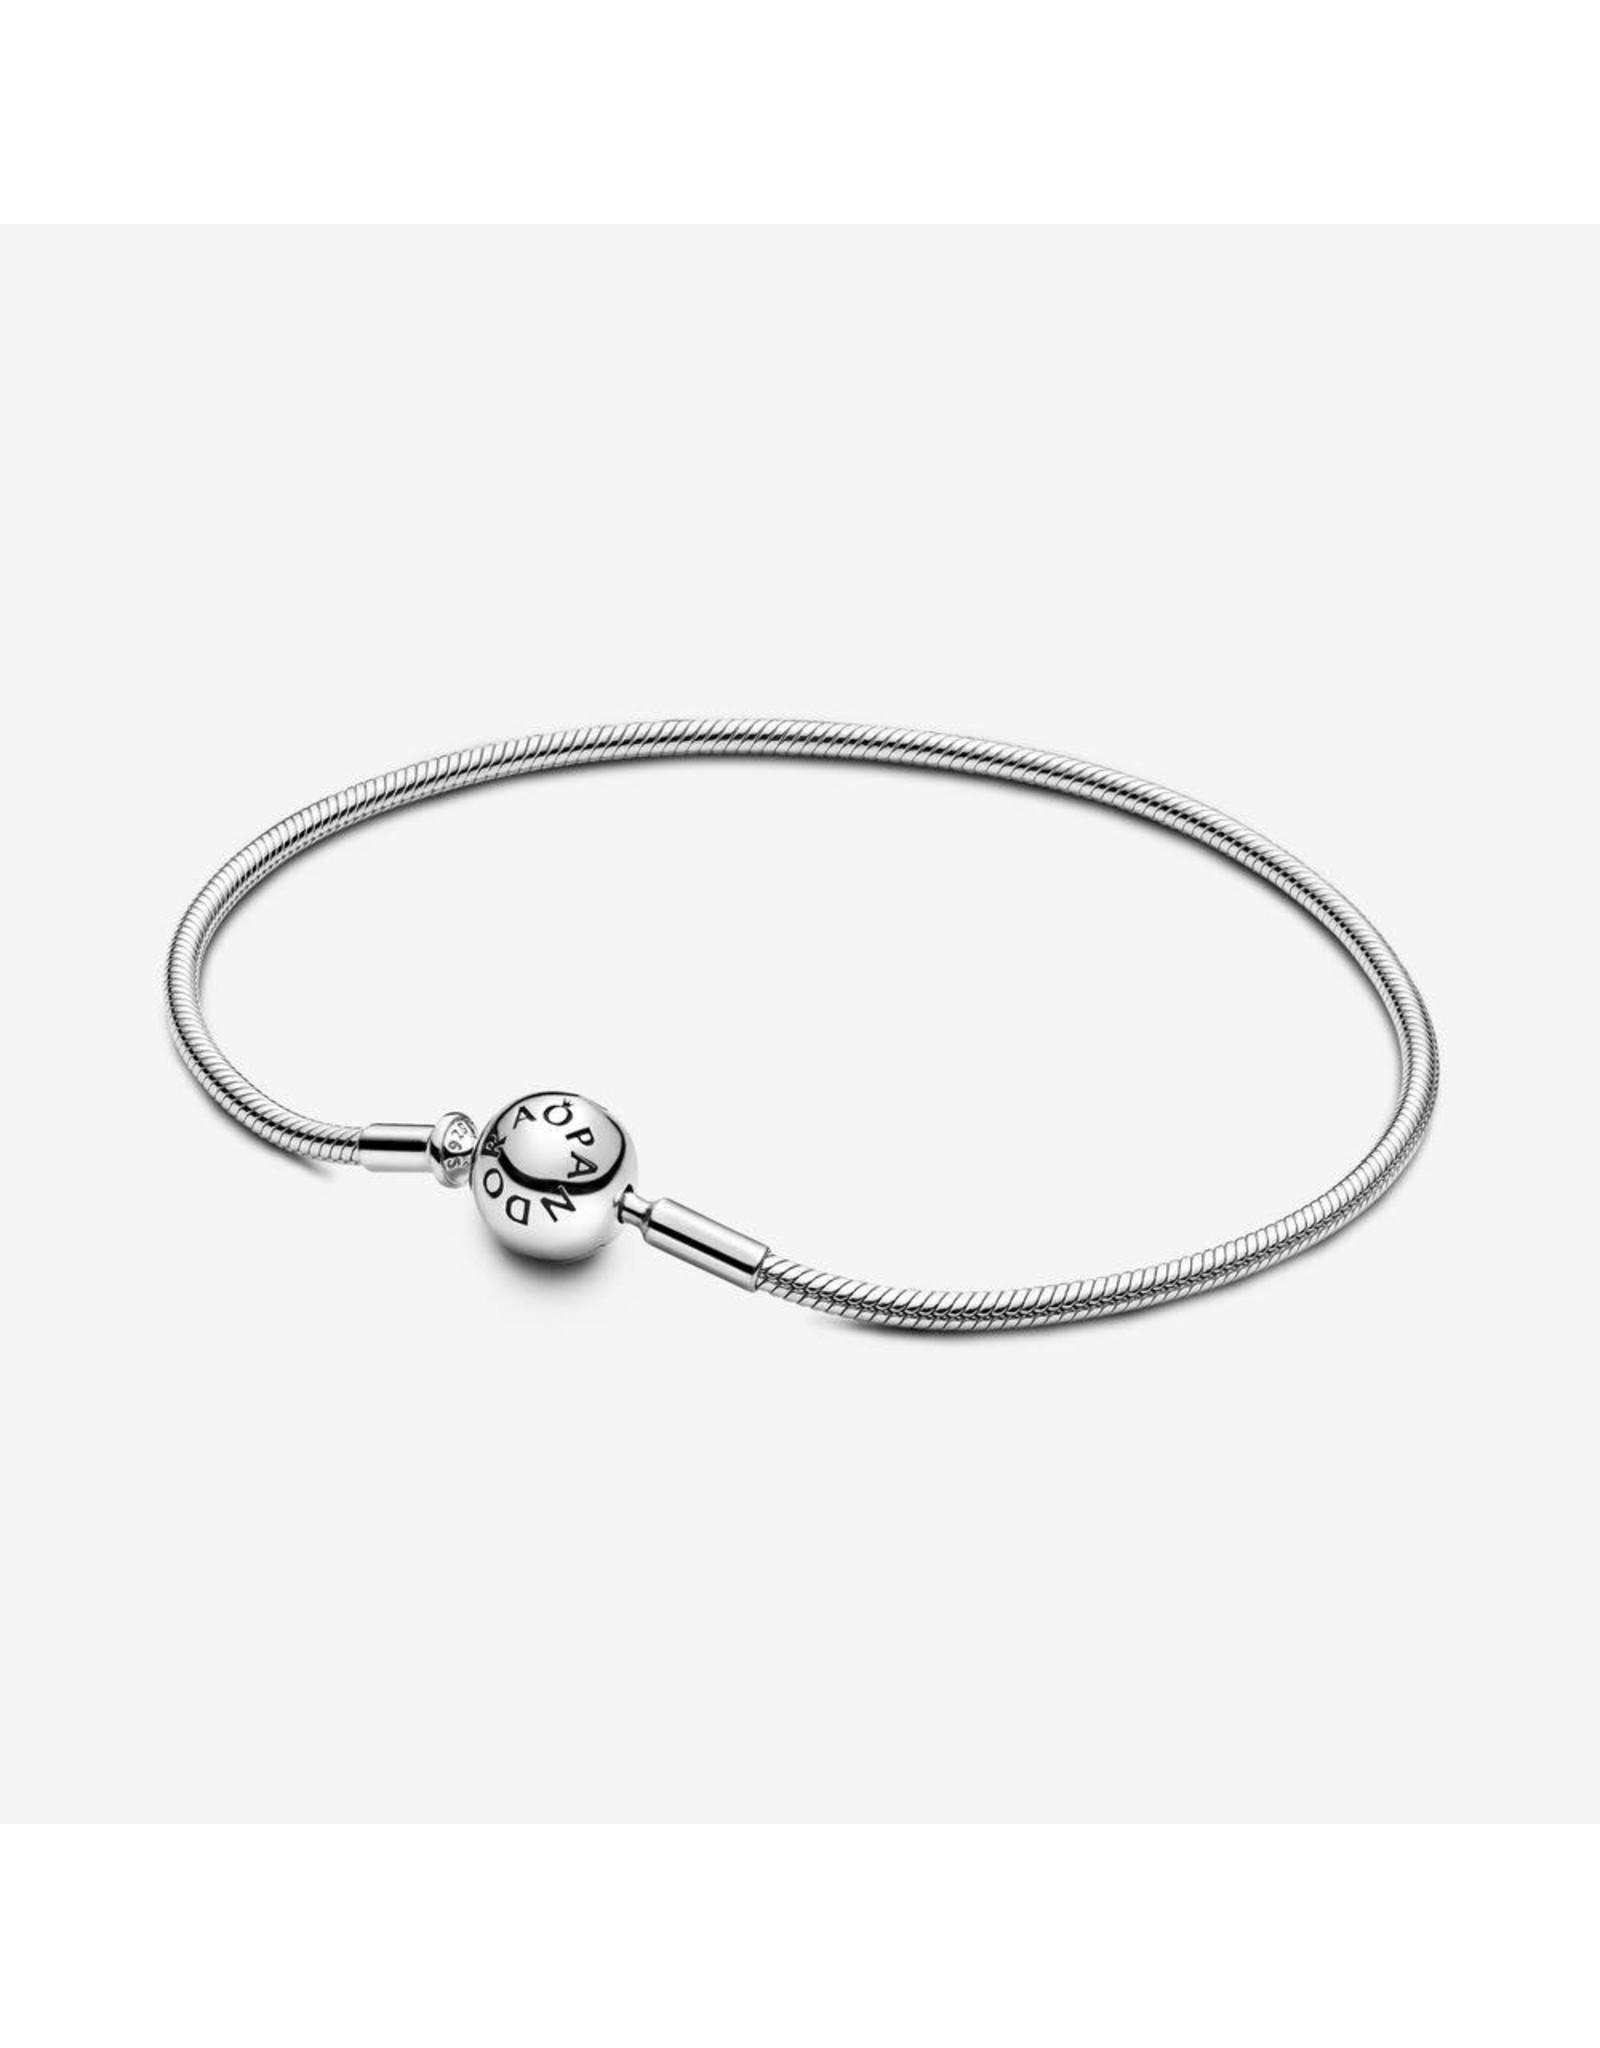 Pandora Pandora Me Bracelet, 598408C00,Snake Chain Sterling Silver 17 cm